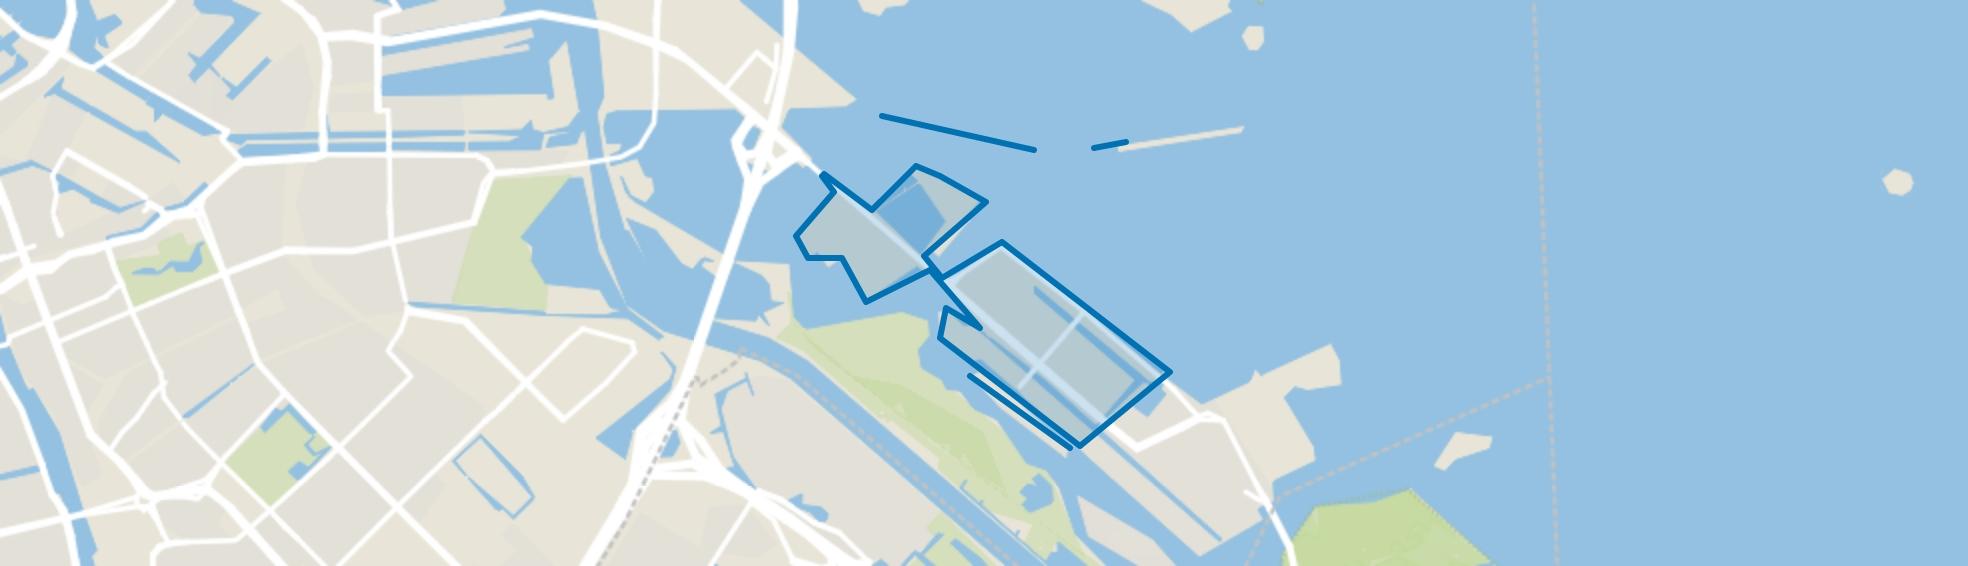 IJburg West, Amsterdam map